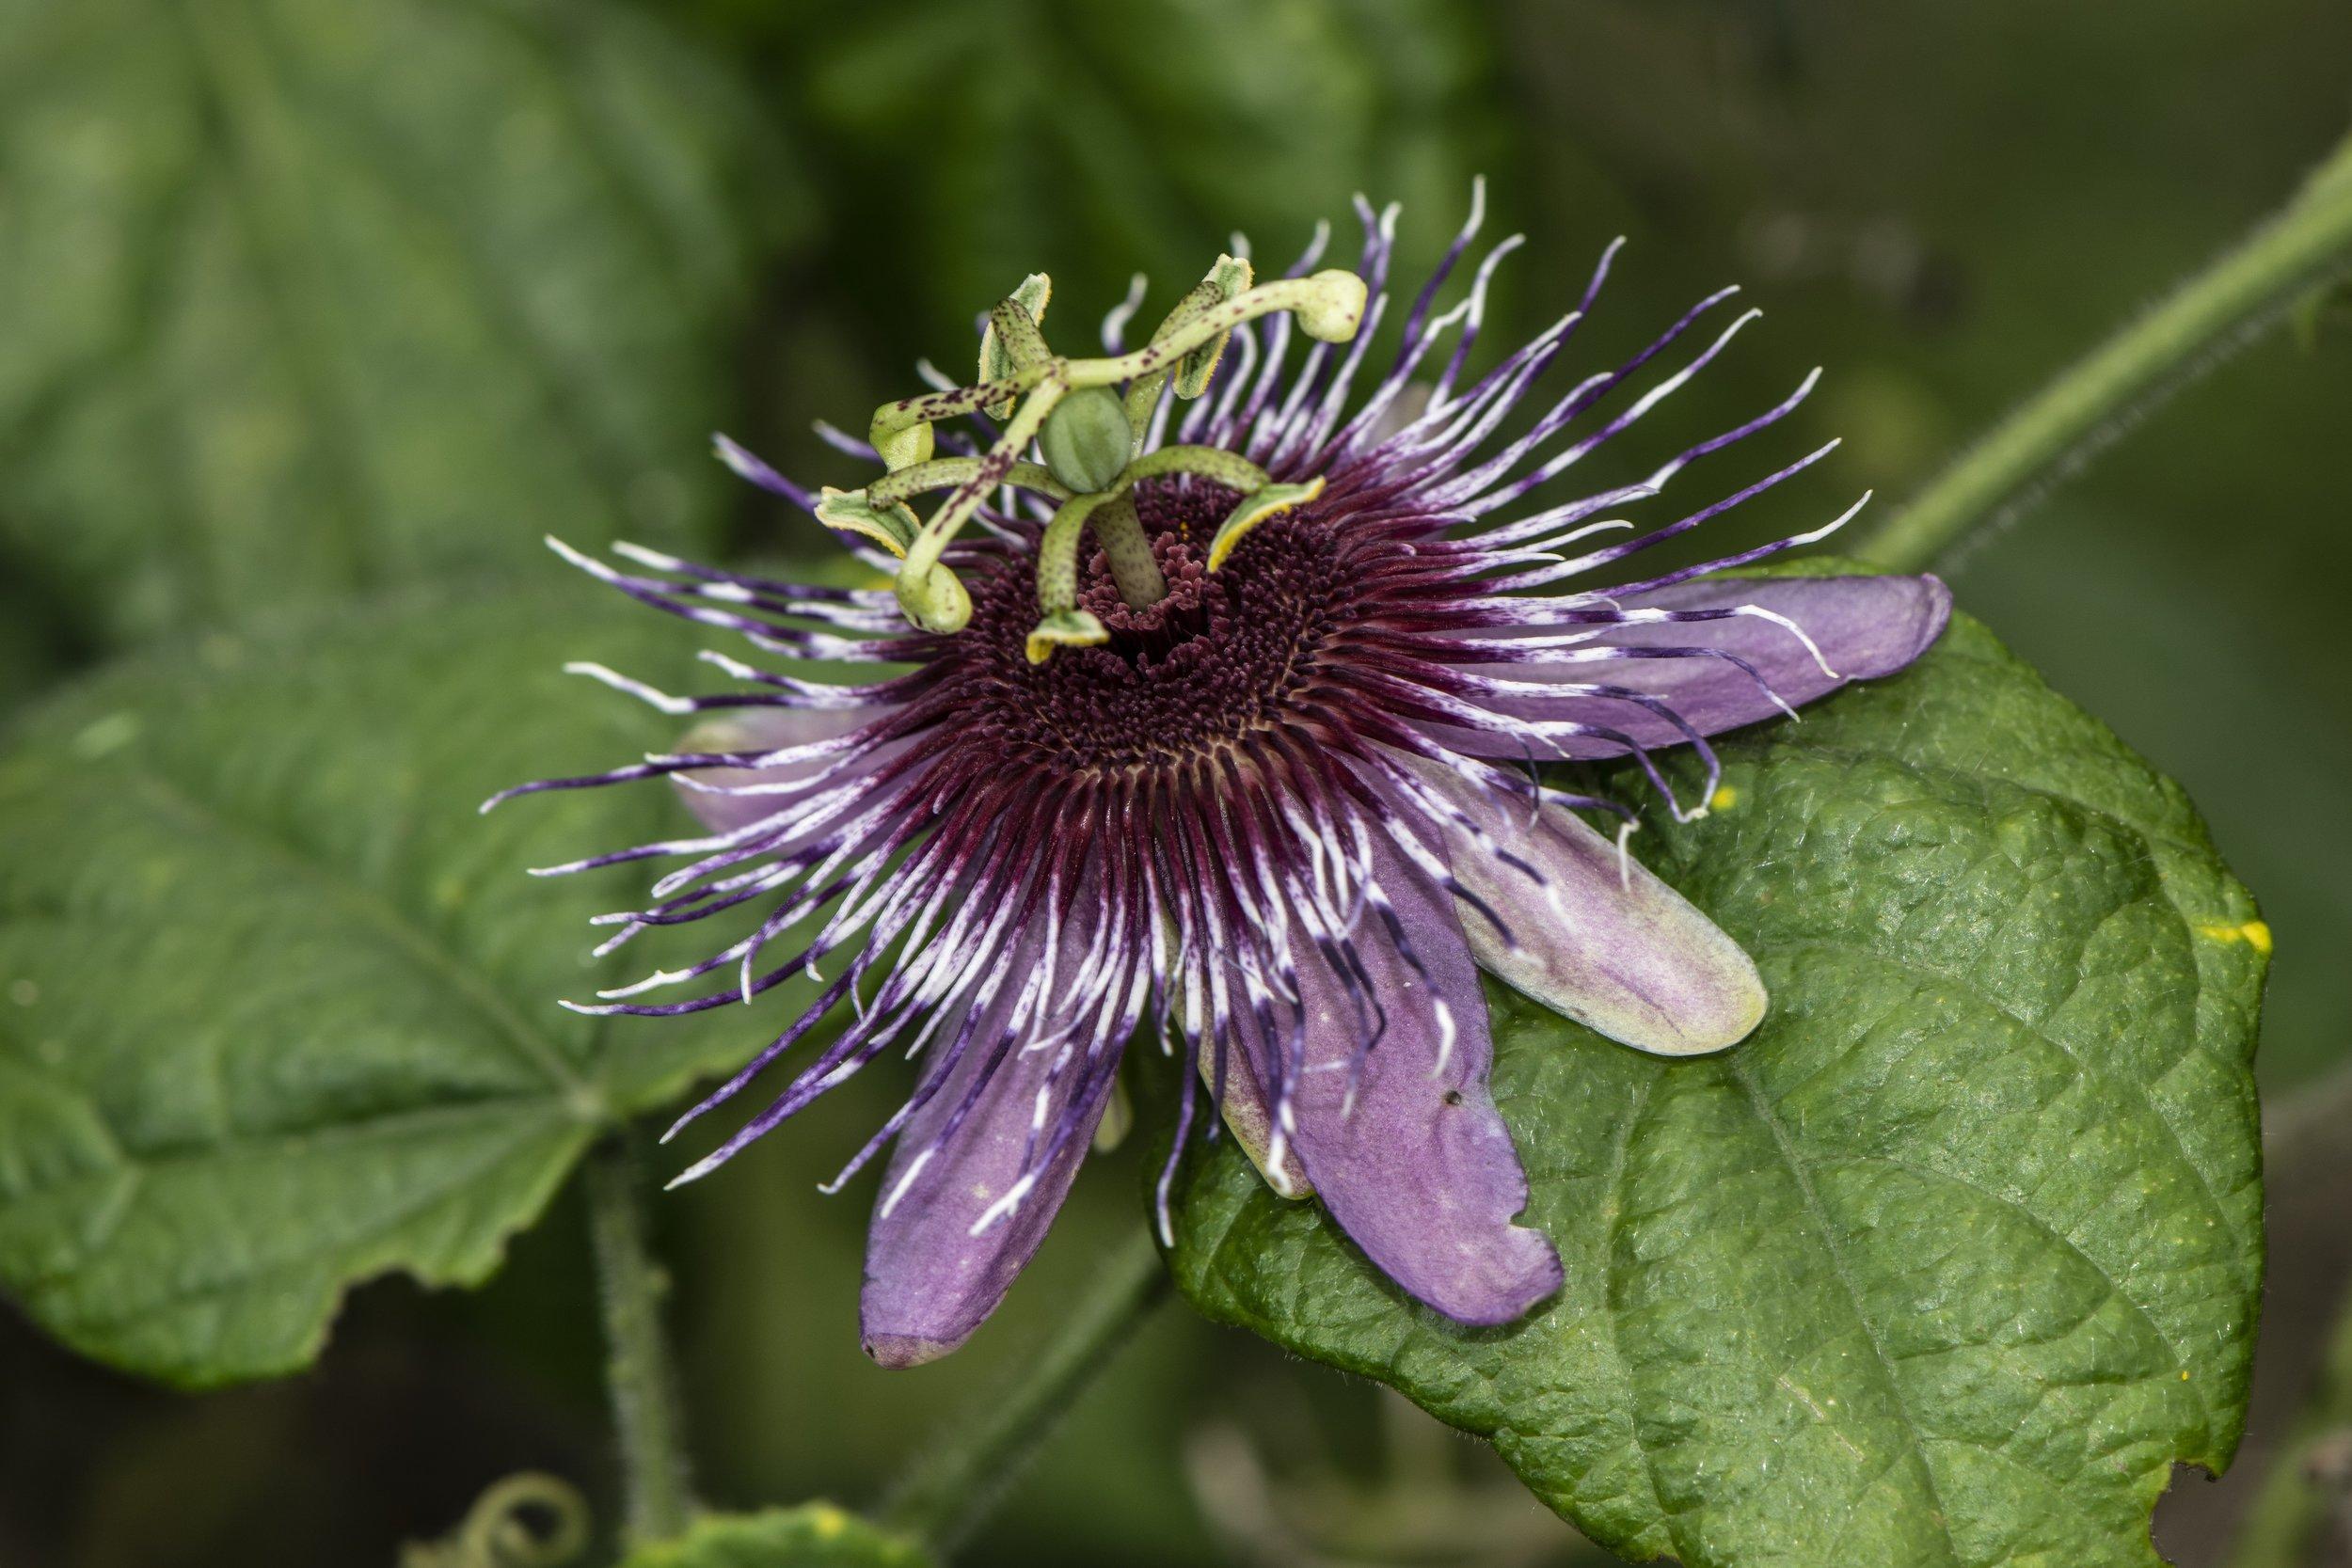 Passiflora danieli